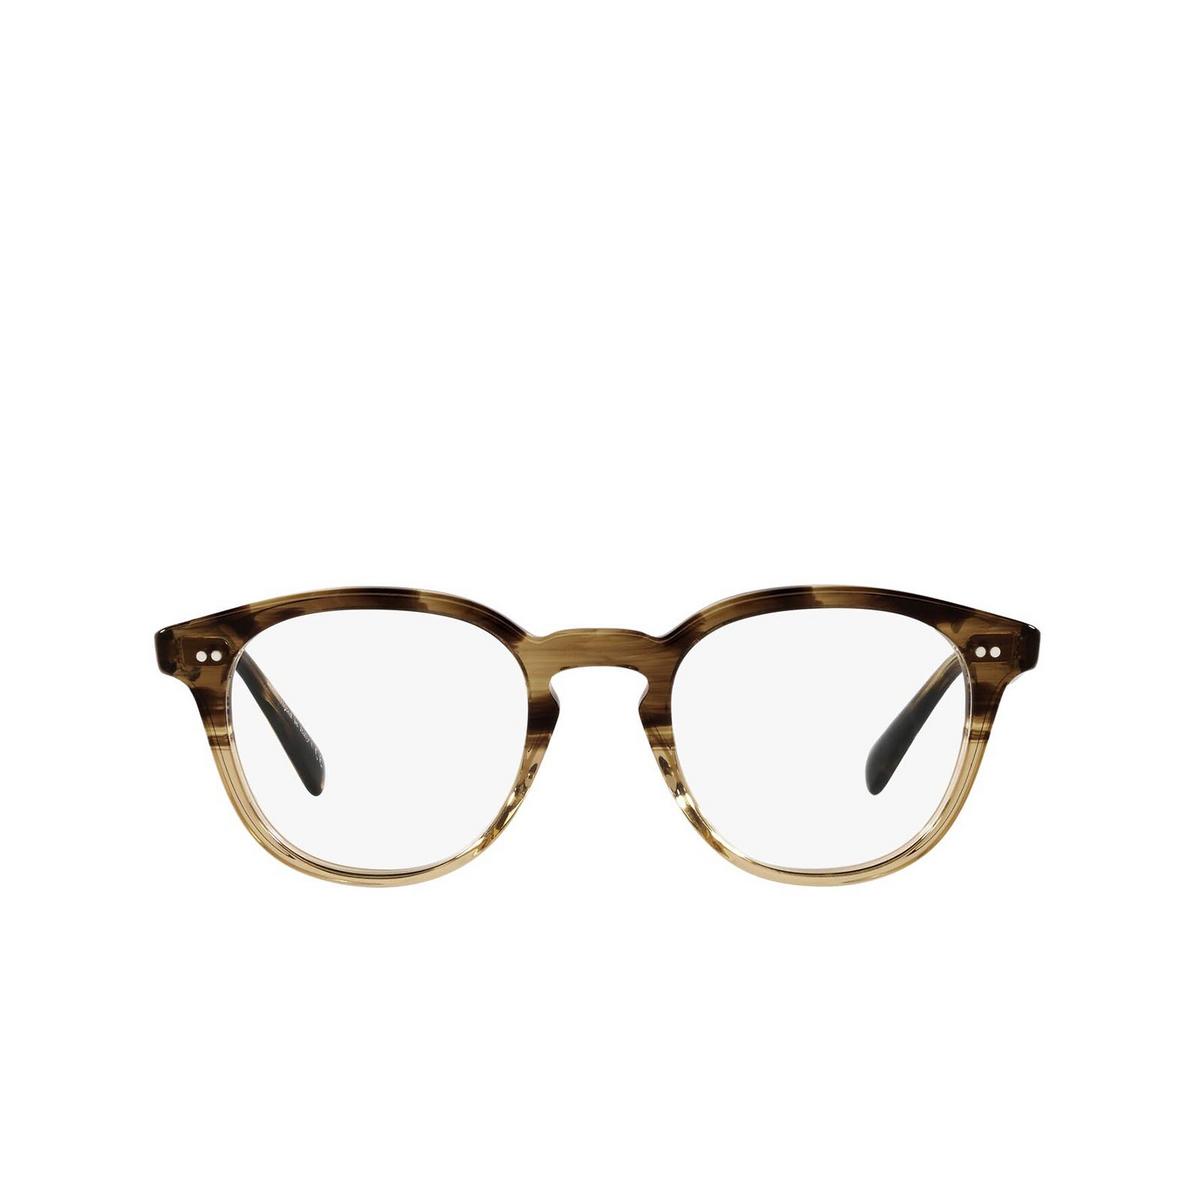 Oliver Peoples® Square Eyeglasses: Desmon OV5454U color Canarywood Gradient 1703 - front view.